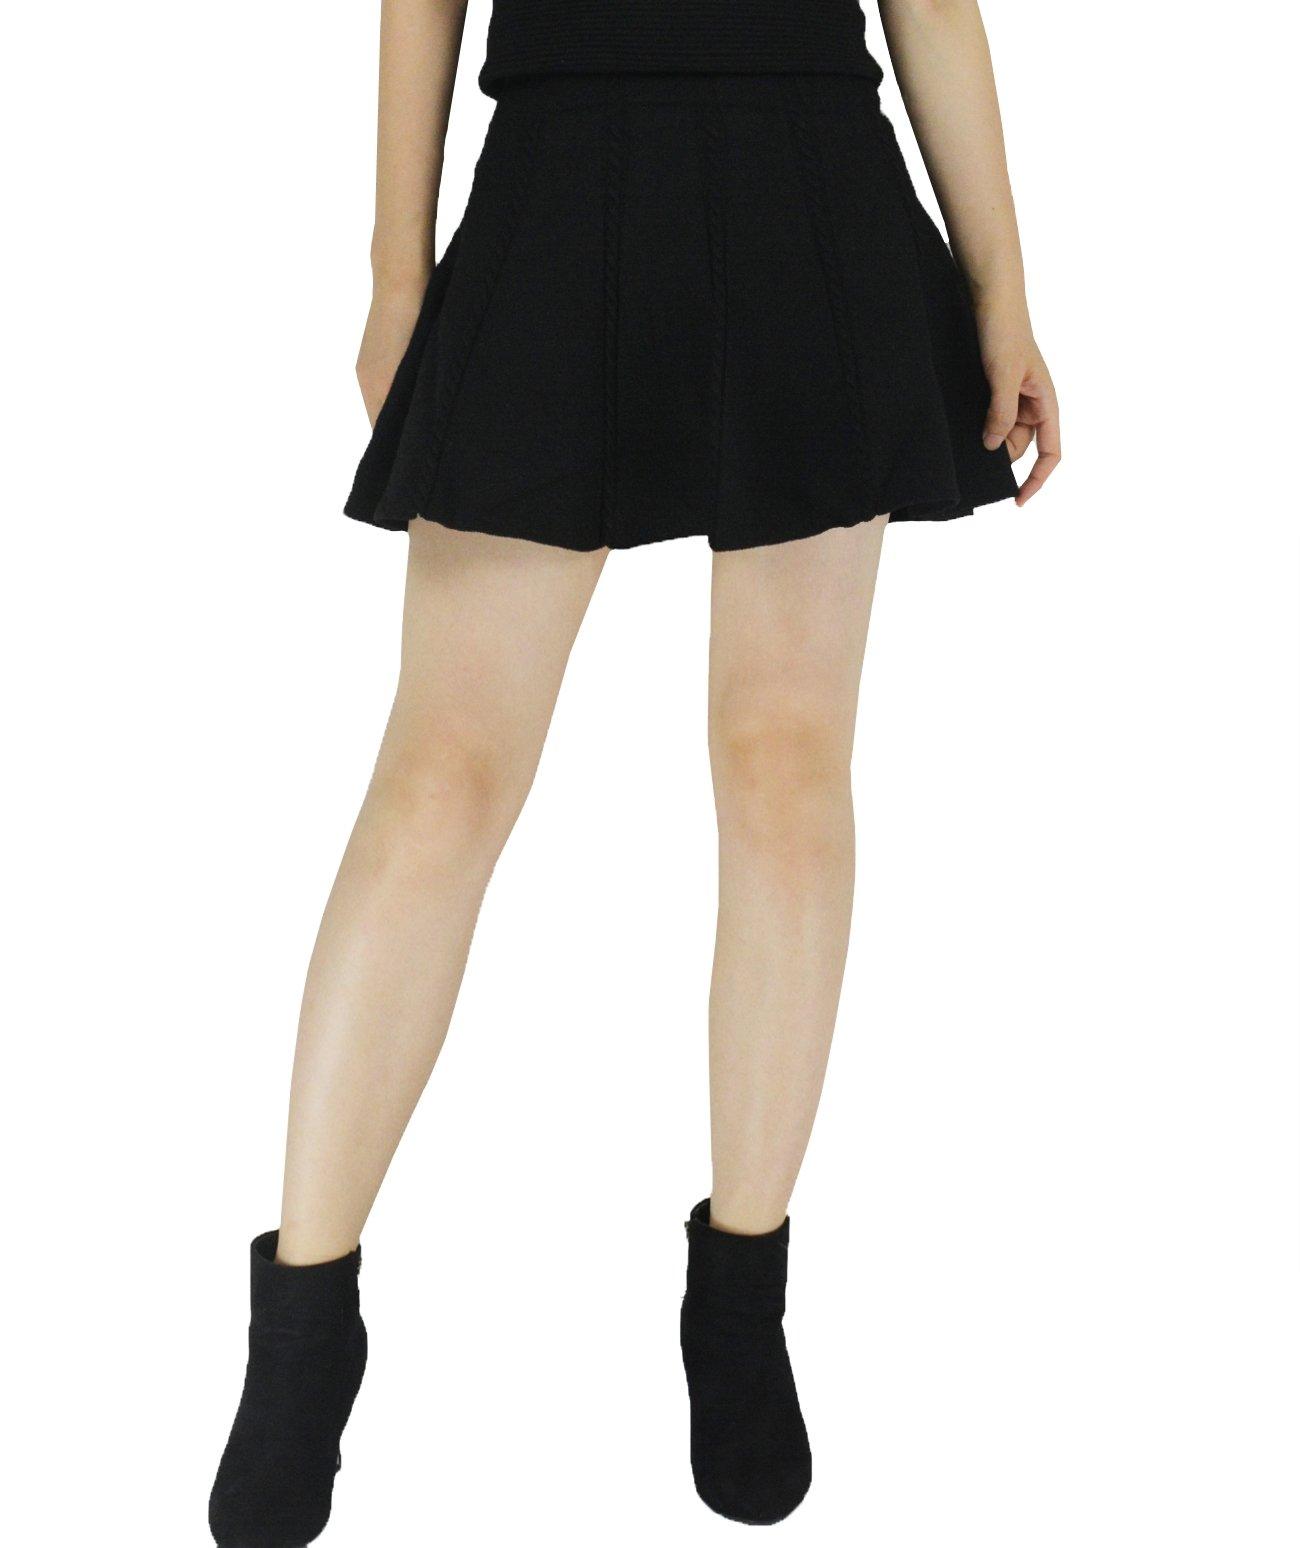 YSJ Lady's Knitted Mini Skirt High Waist A-line 17-inch Skirts (Black Bling)